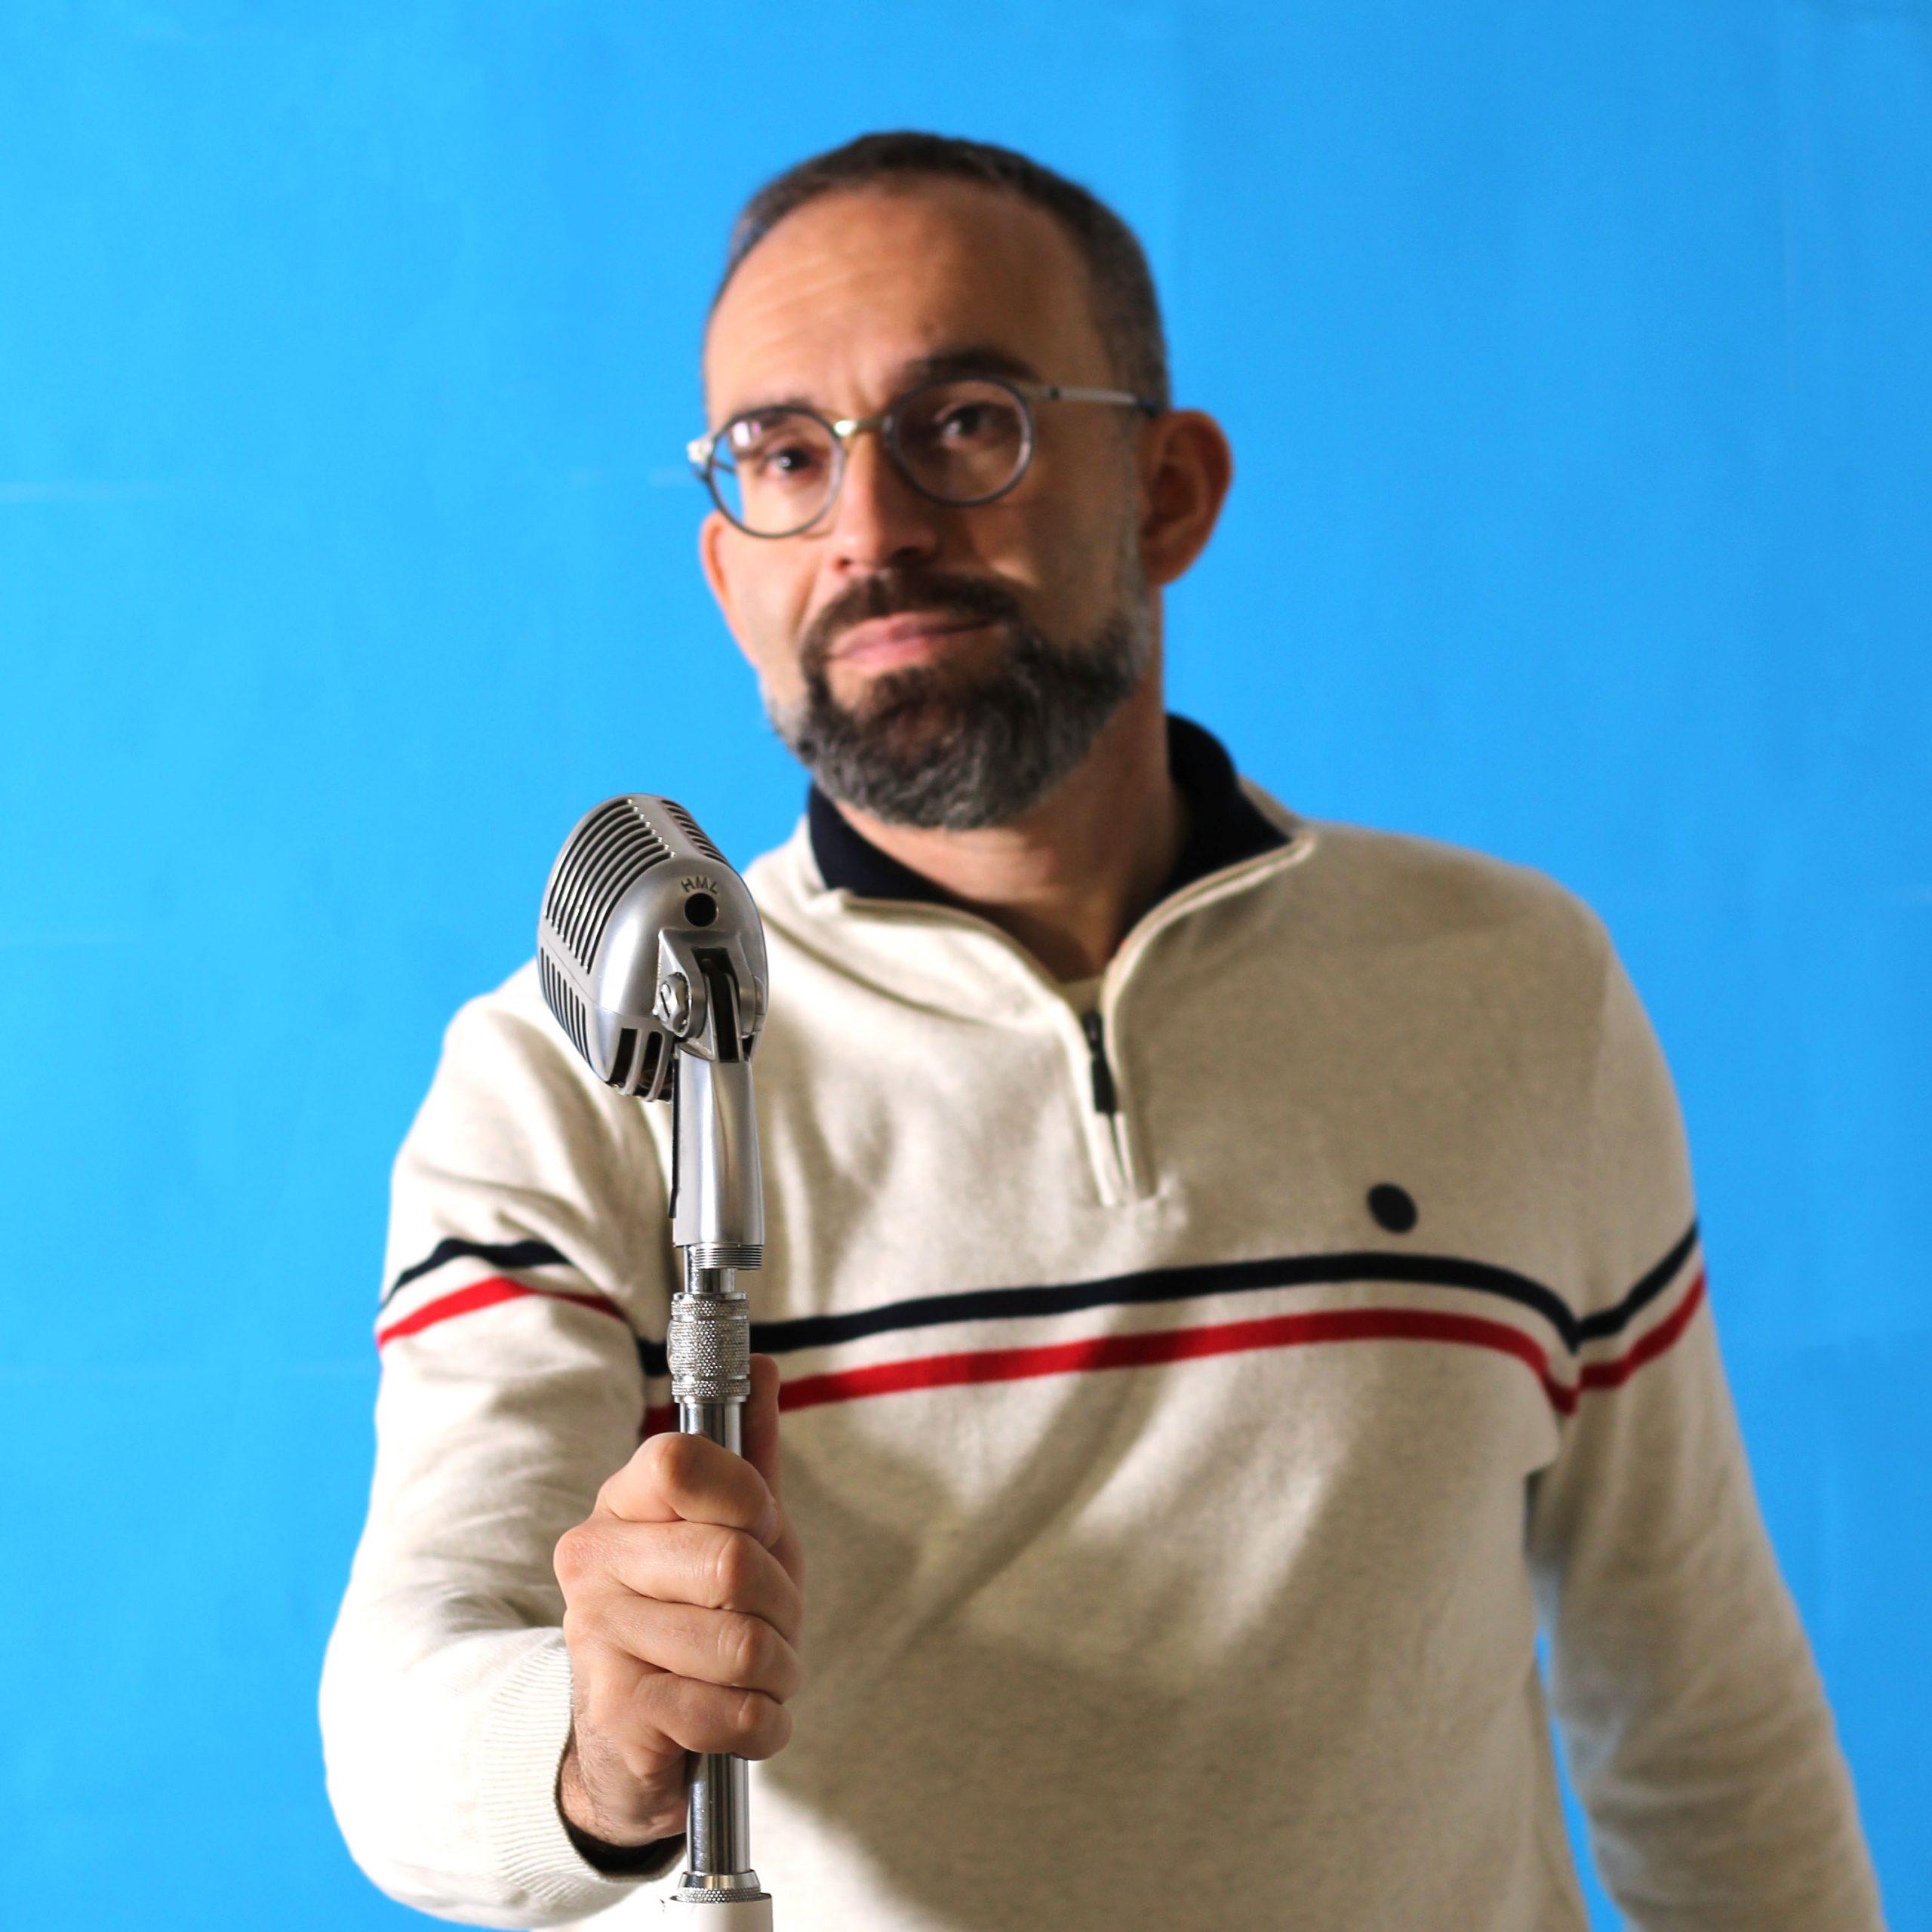 Manu Martínez